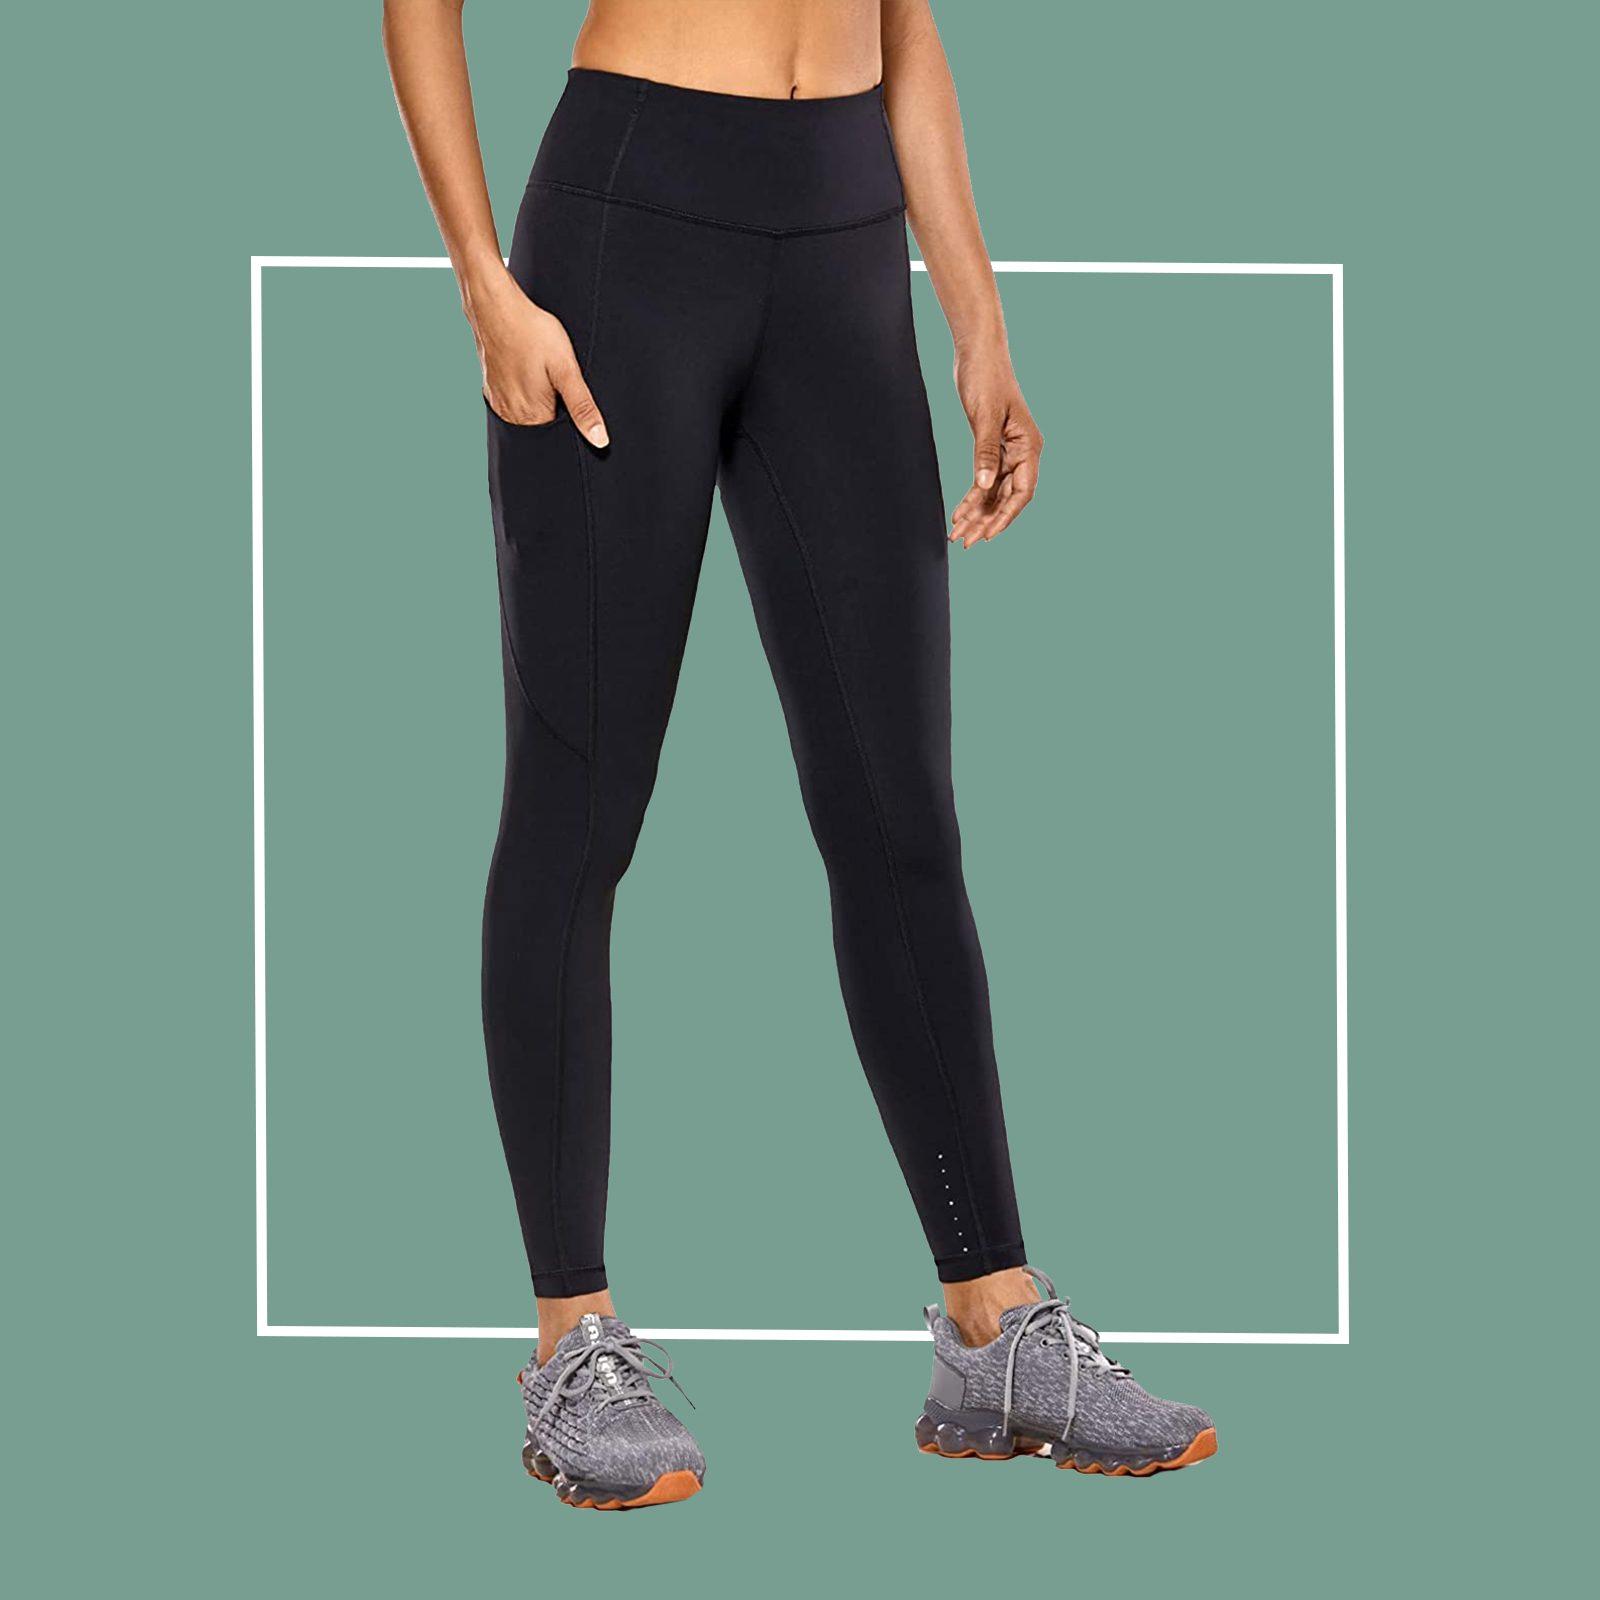 crz yoga leggings